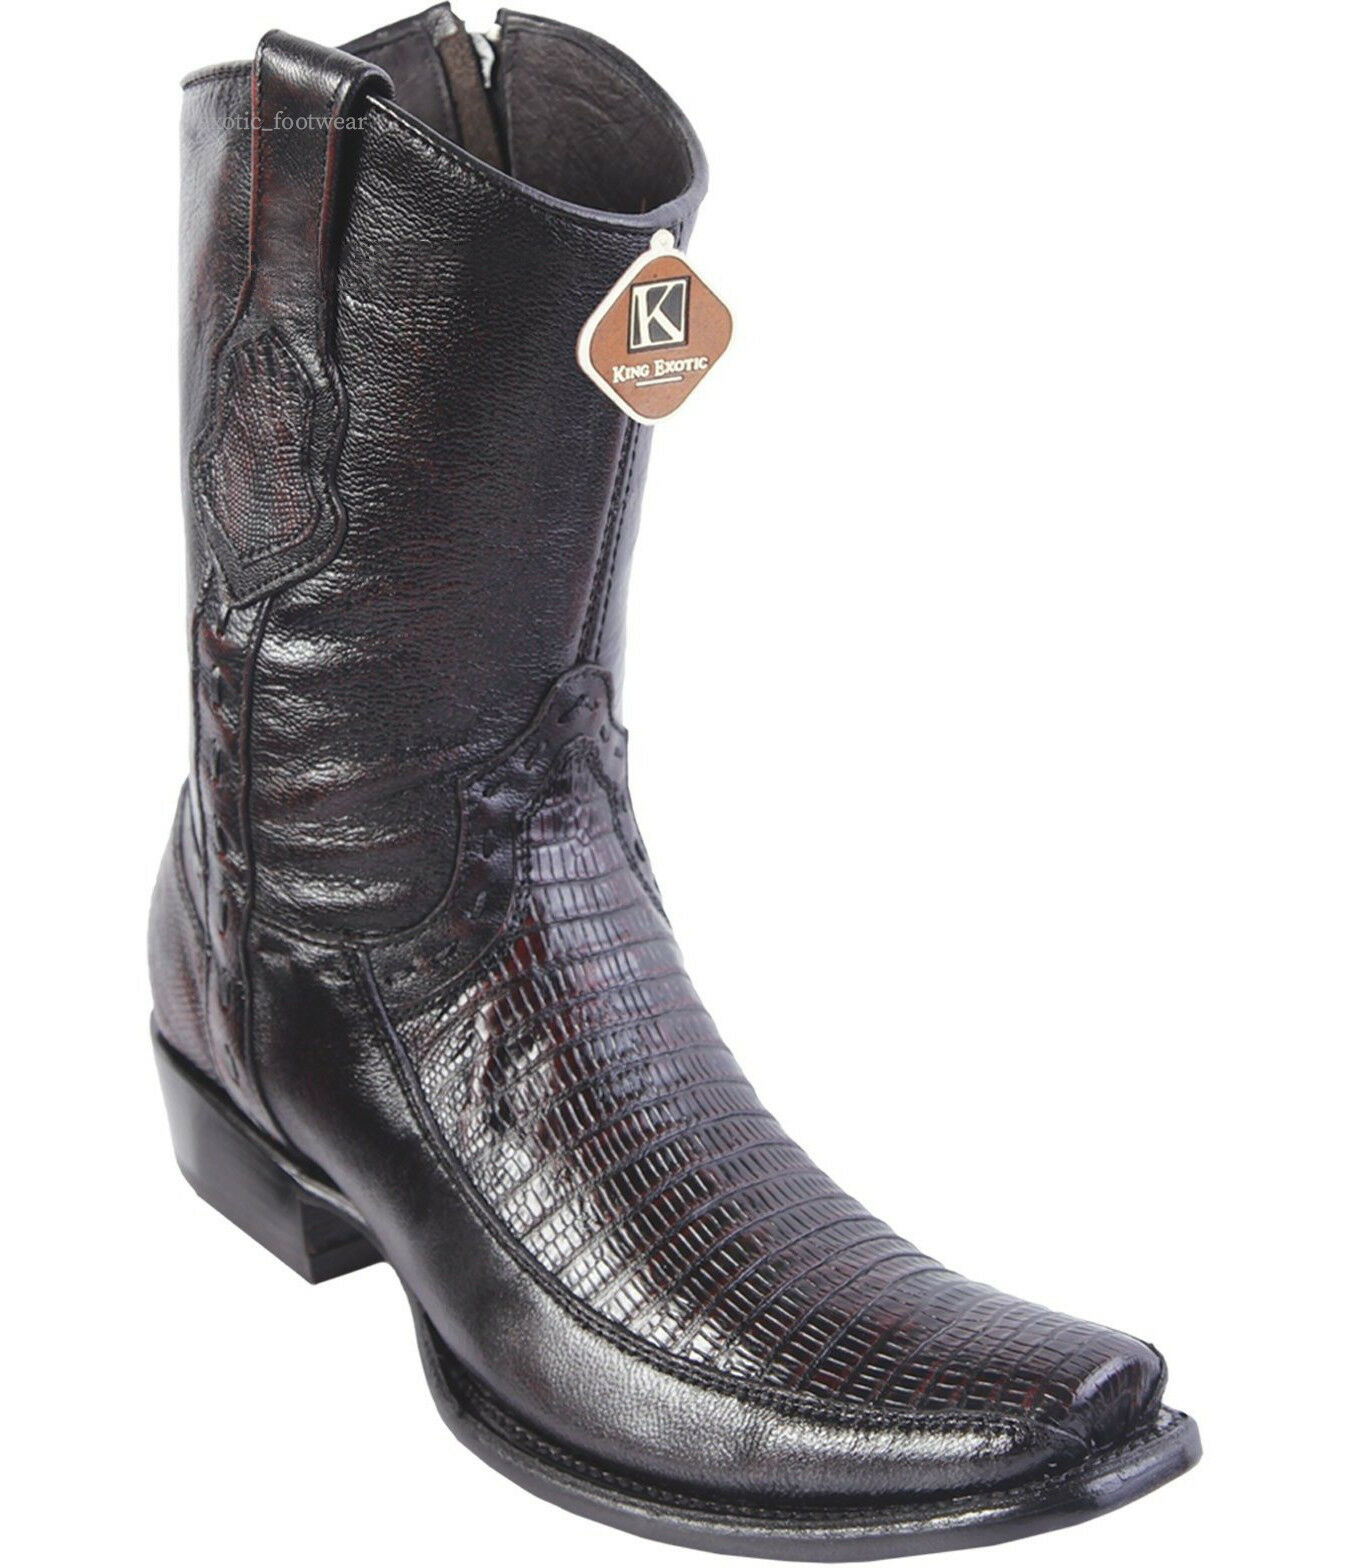 Men's King Exotic Genuine Teju Lizard With Deer Western Boots Inside Zipper